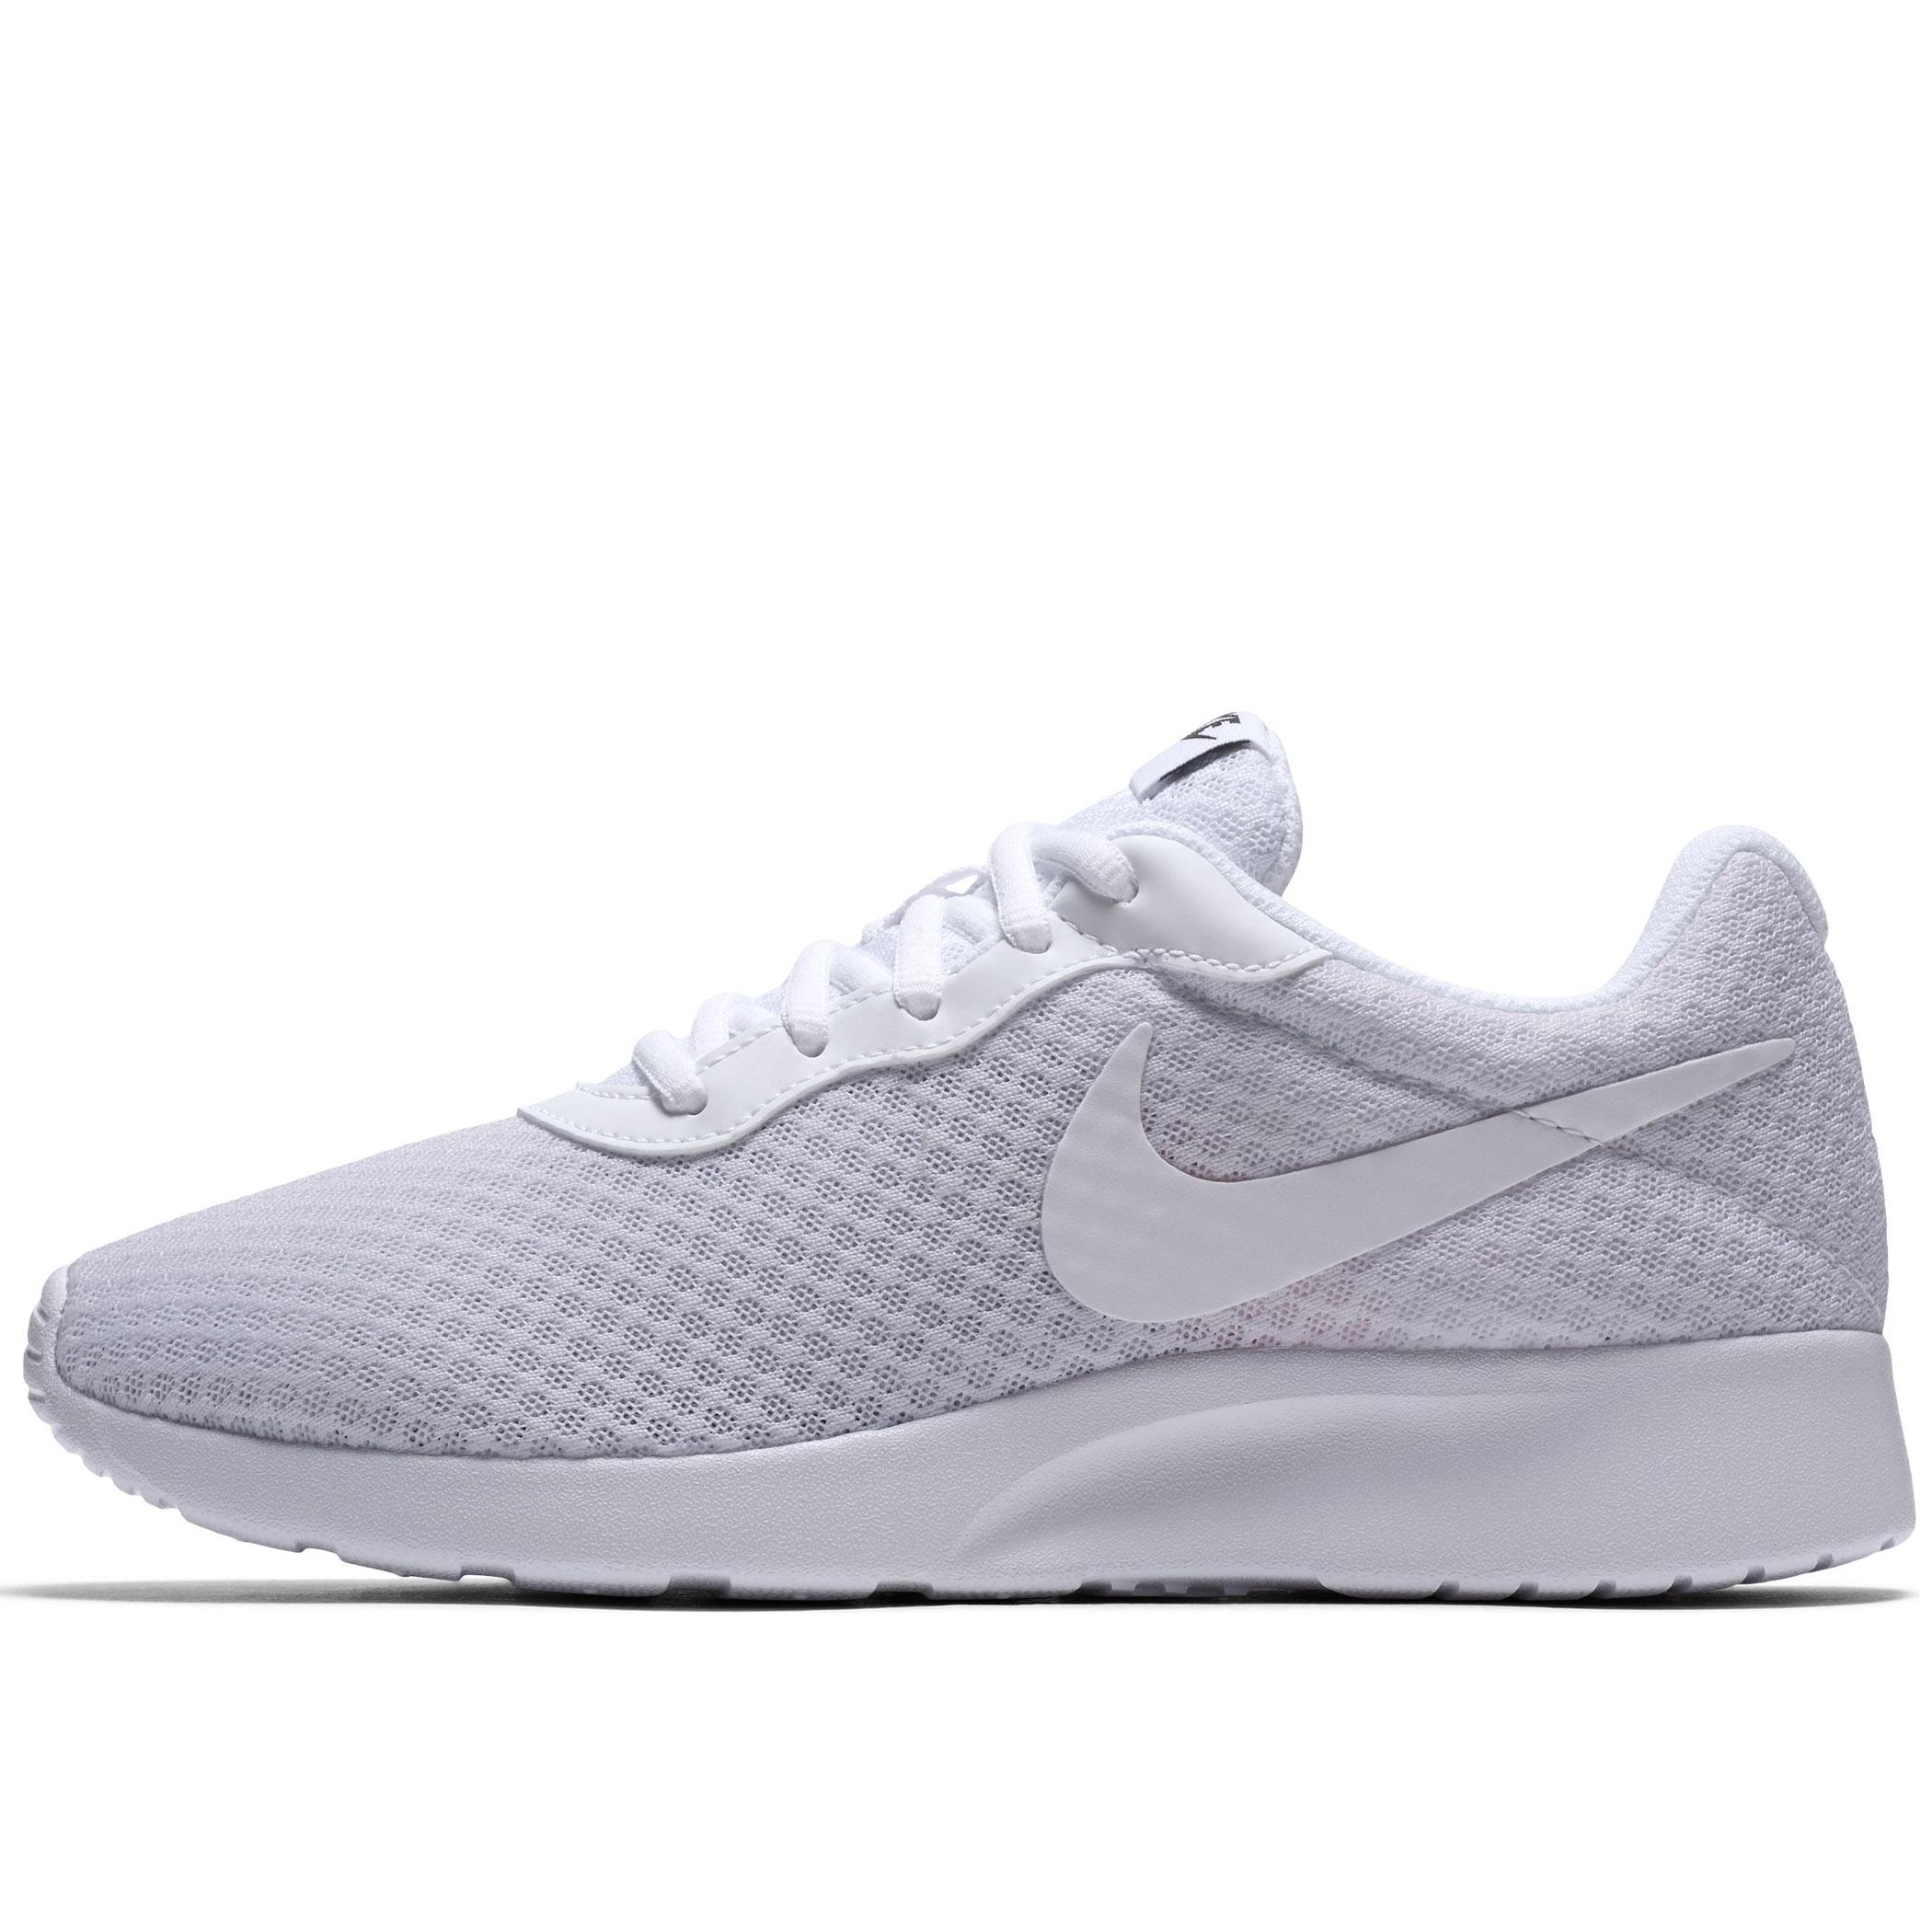 49676ac0 Кроссовки Tanjun от Nike (812655-110) - продажа, цена, фото, описание